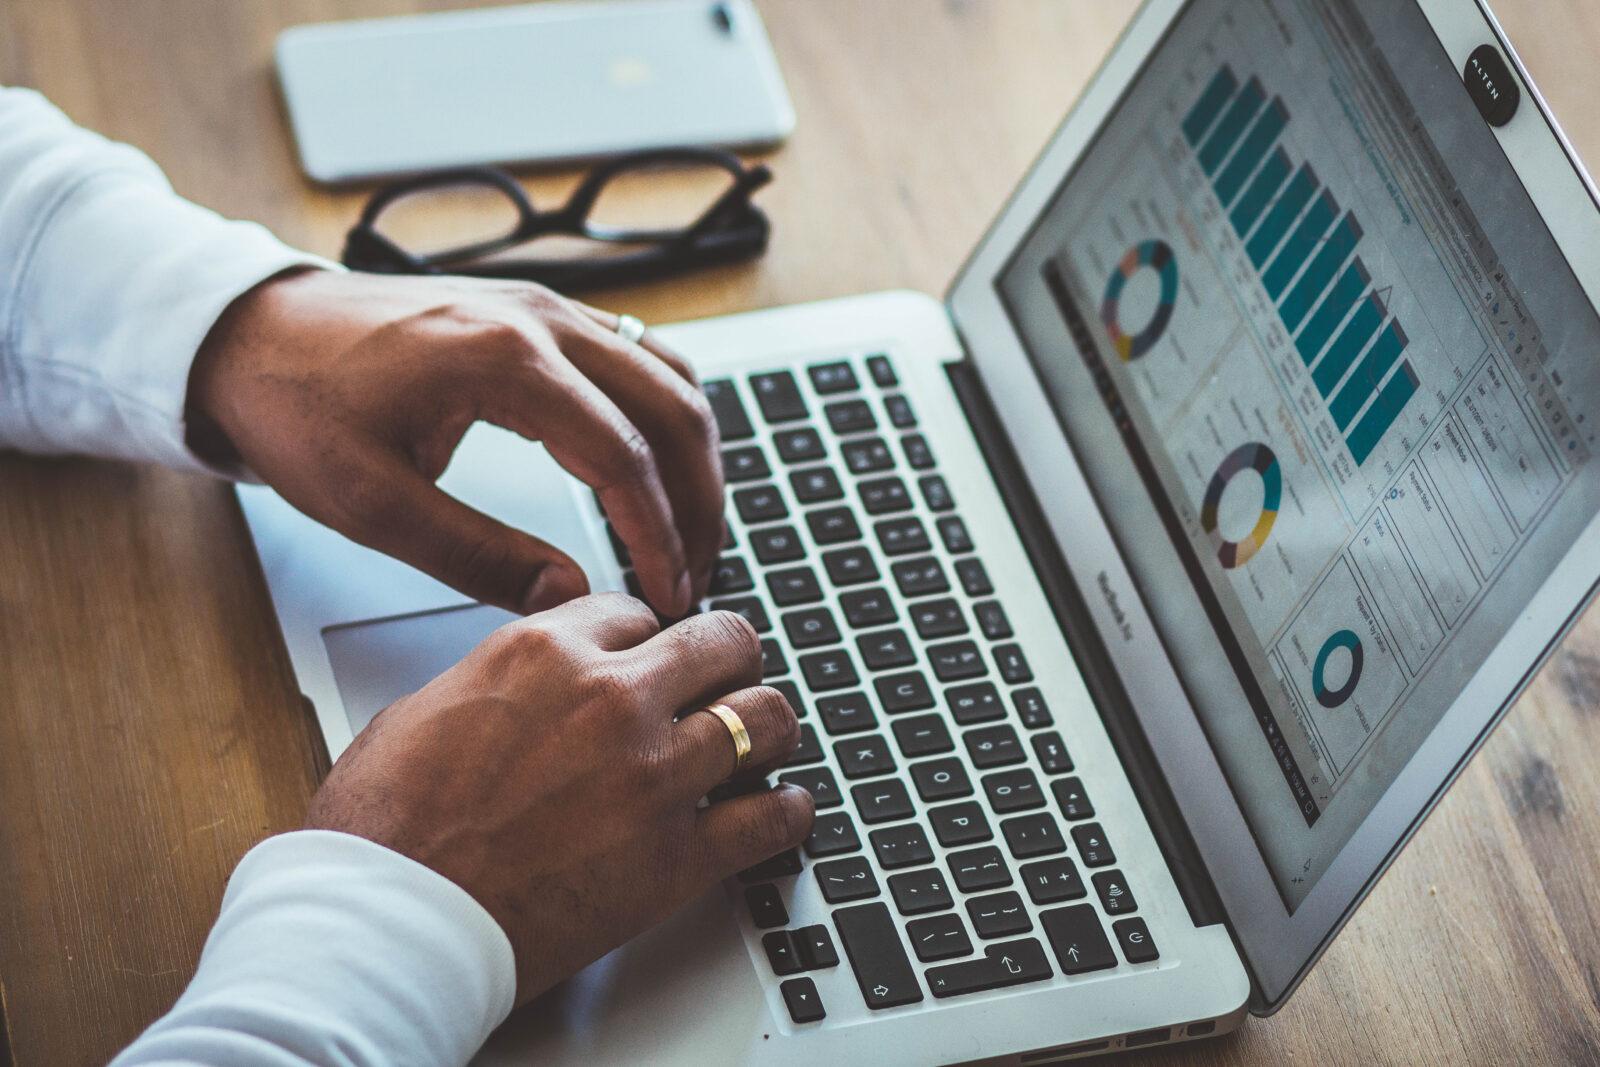 Digital forvaltning – retlige aspekter